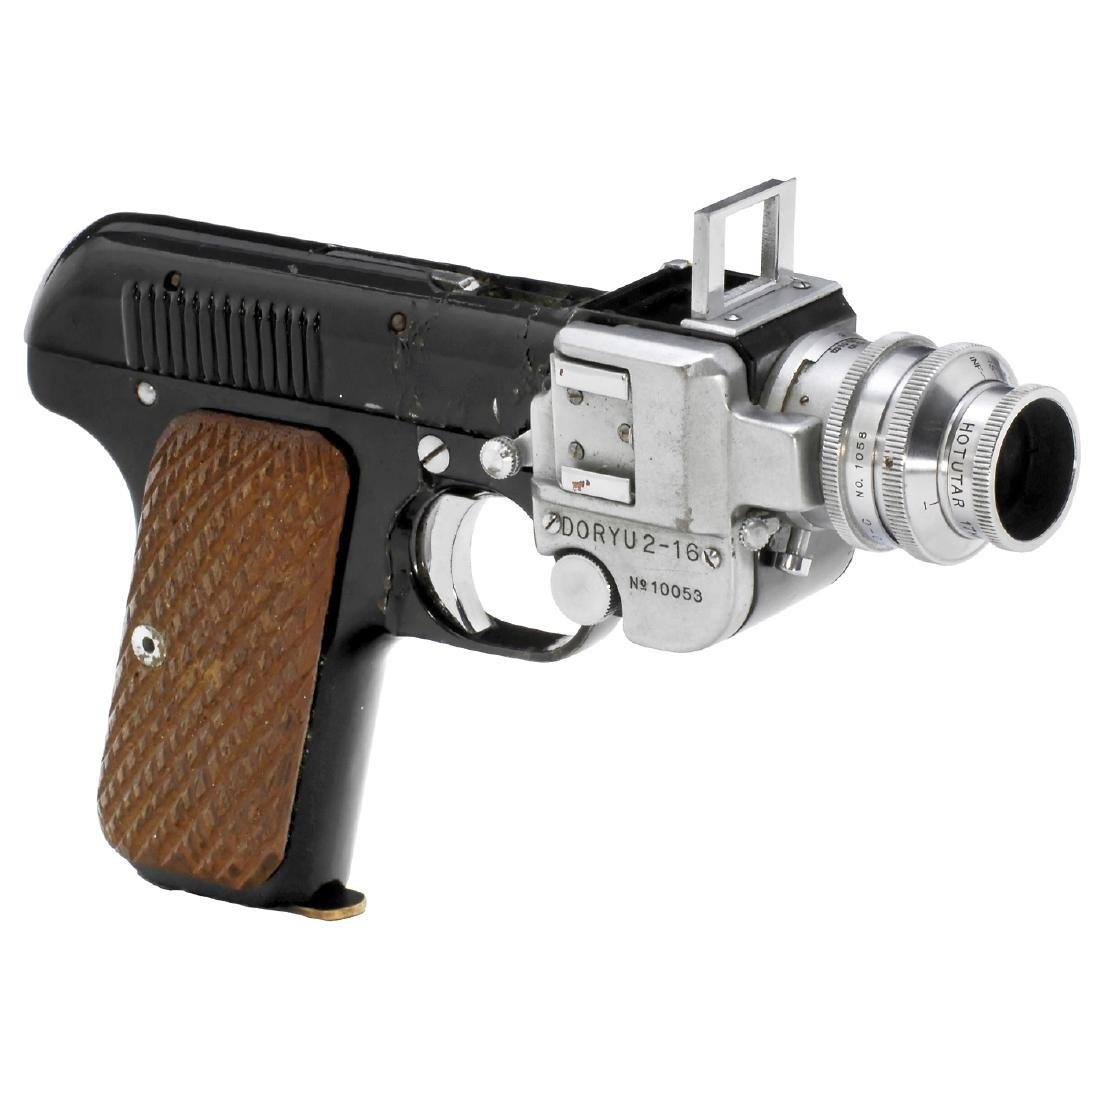 Doryu 2-16 Flash Camera, 1955